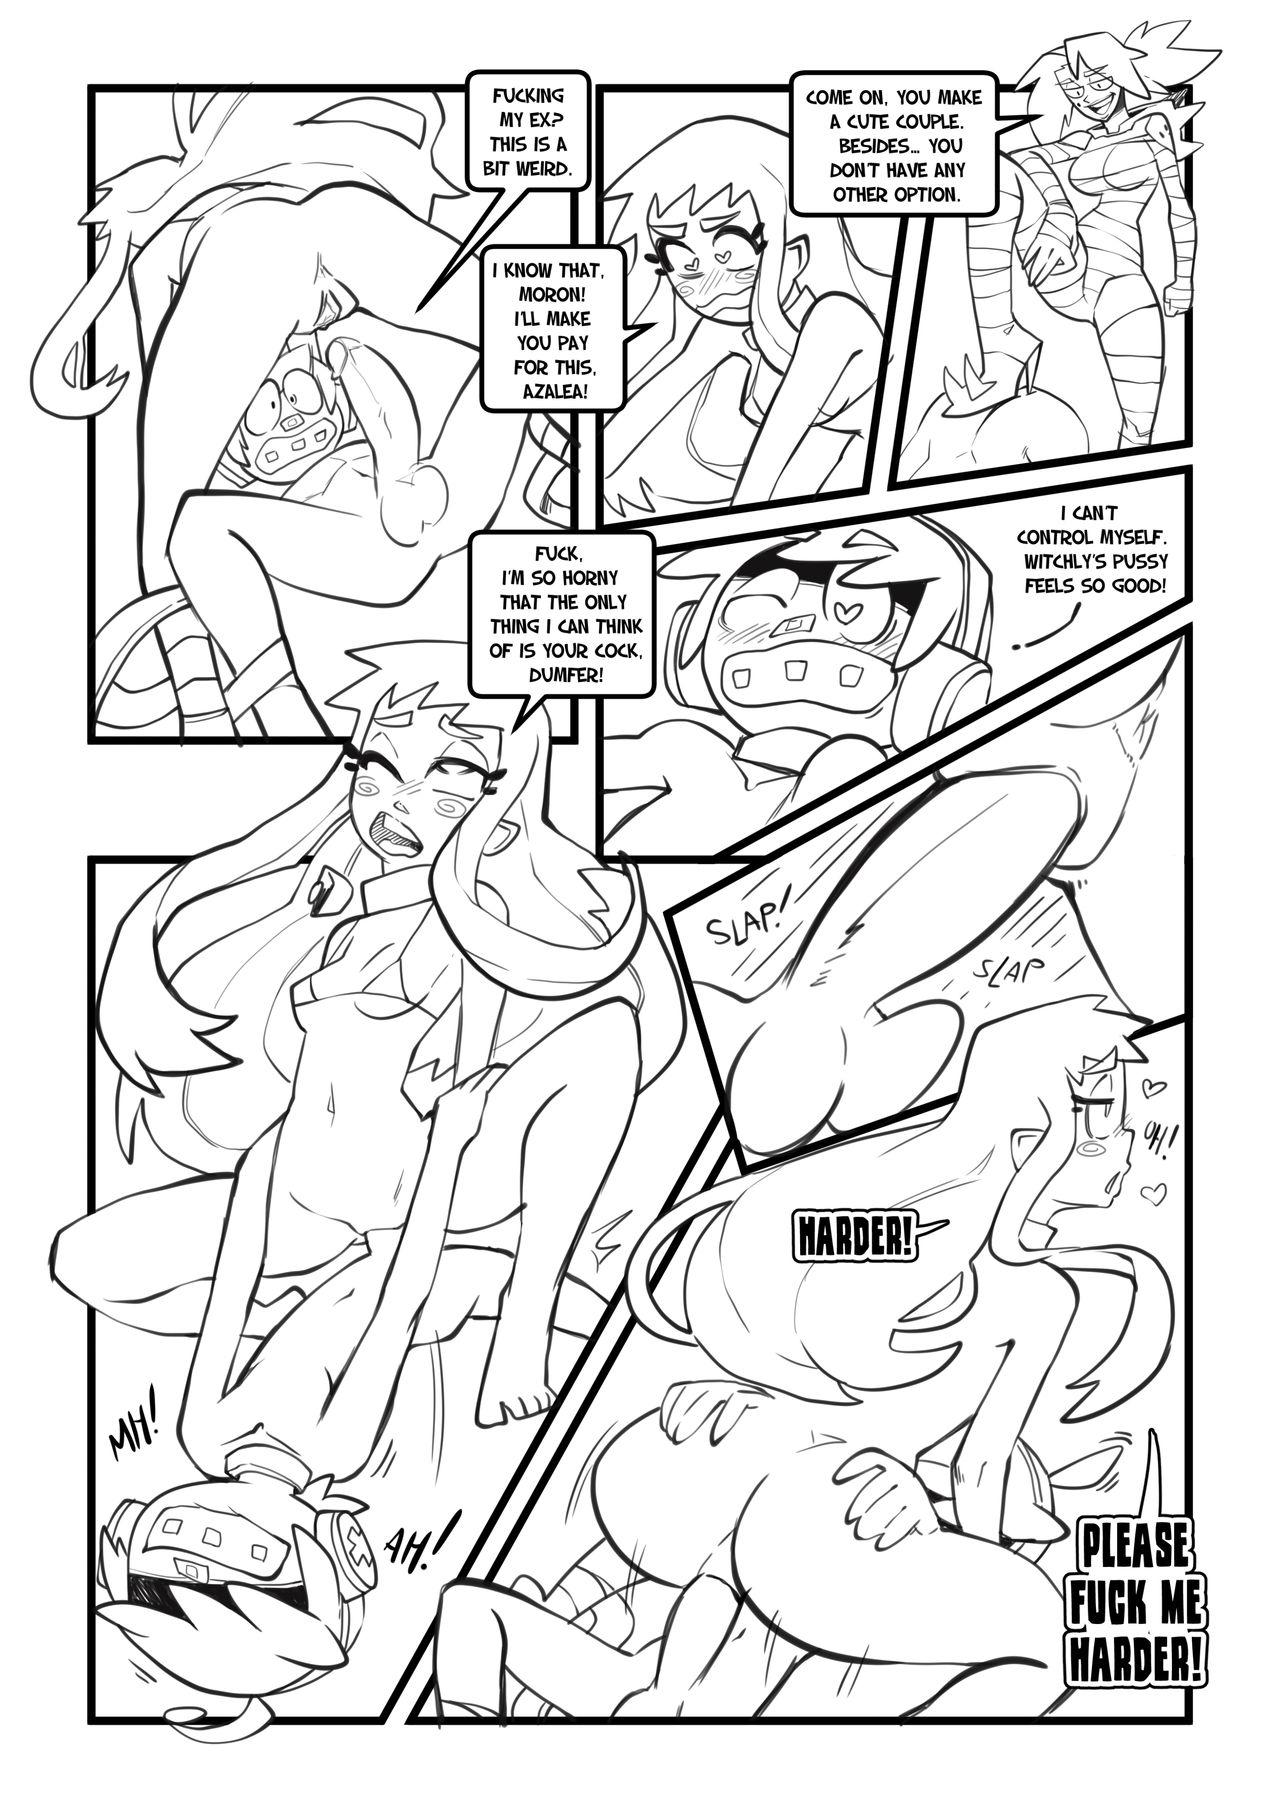 Skarpworld Chapter 8 Hentai 07